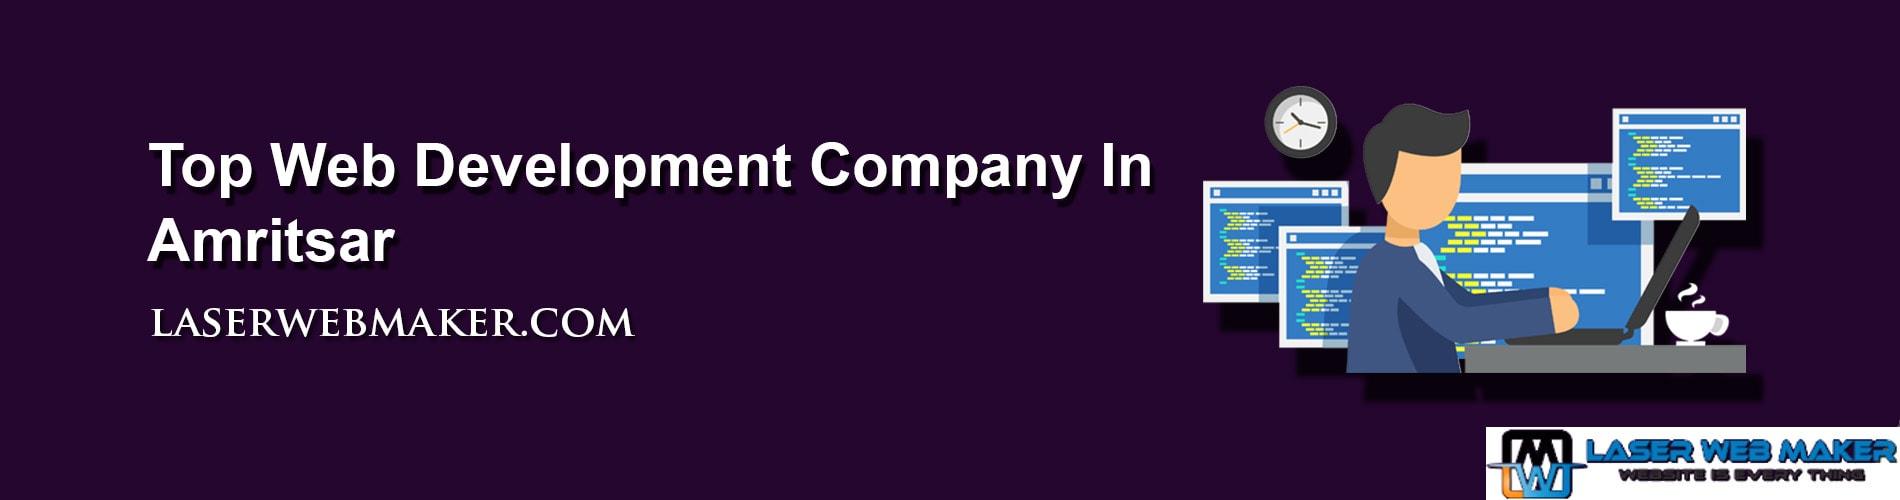 Top web development company in Amritsar